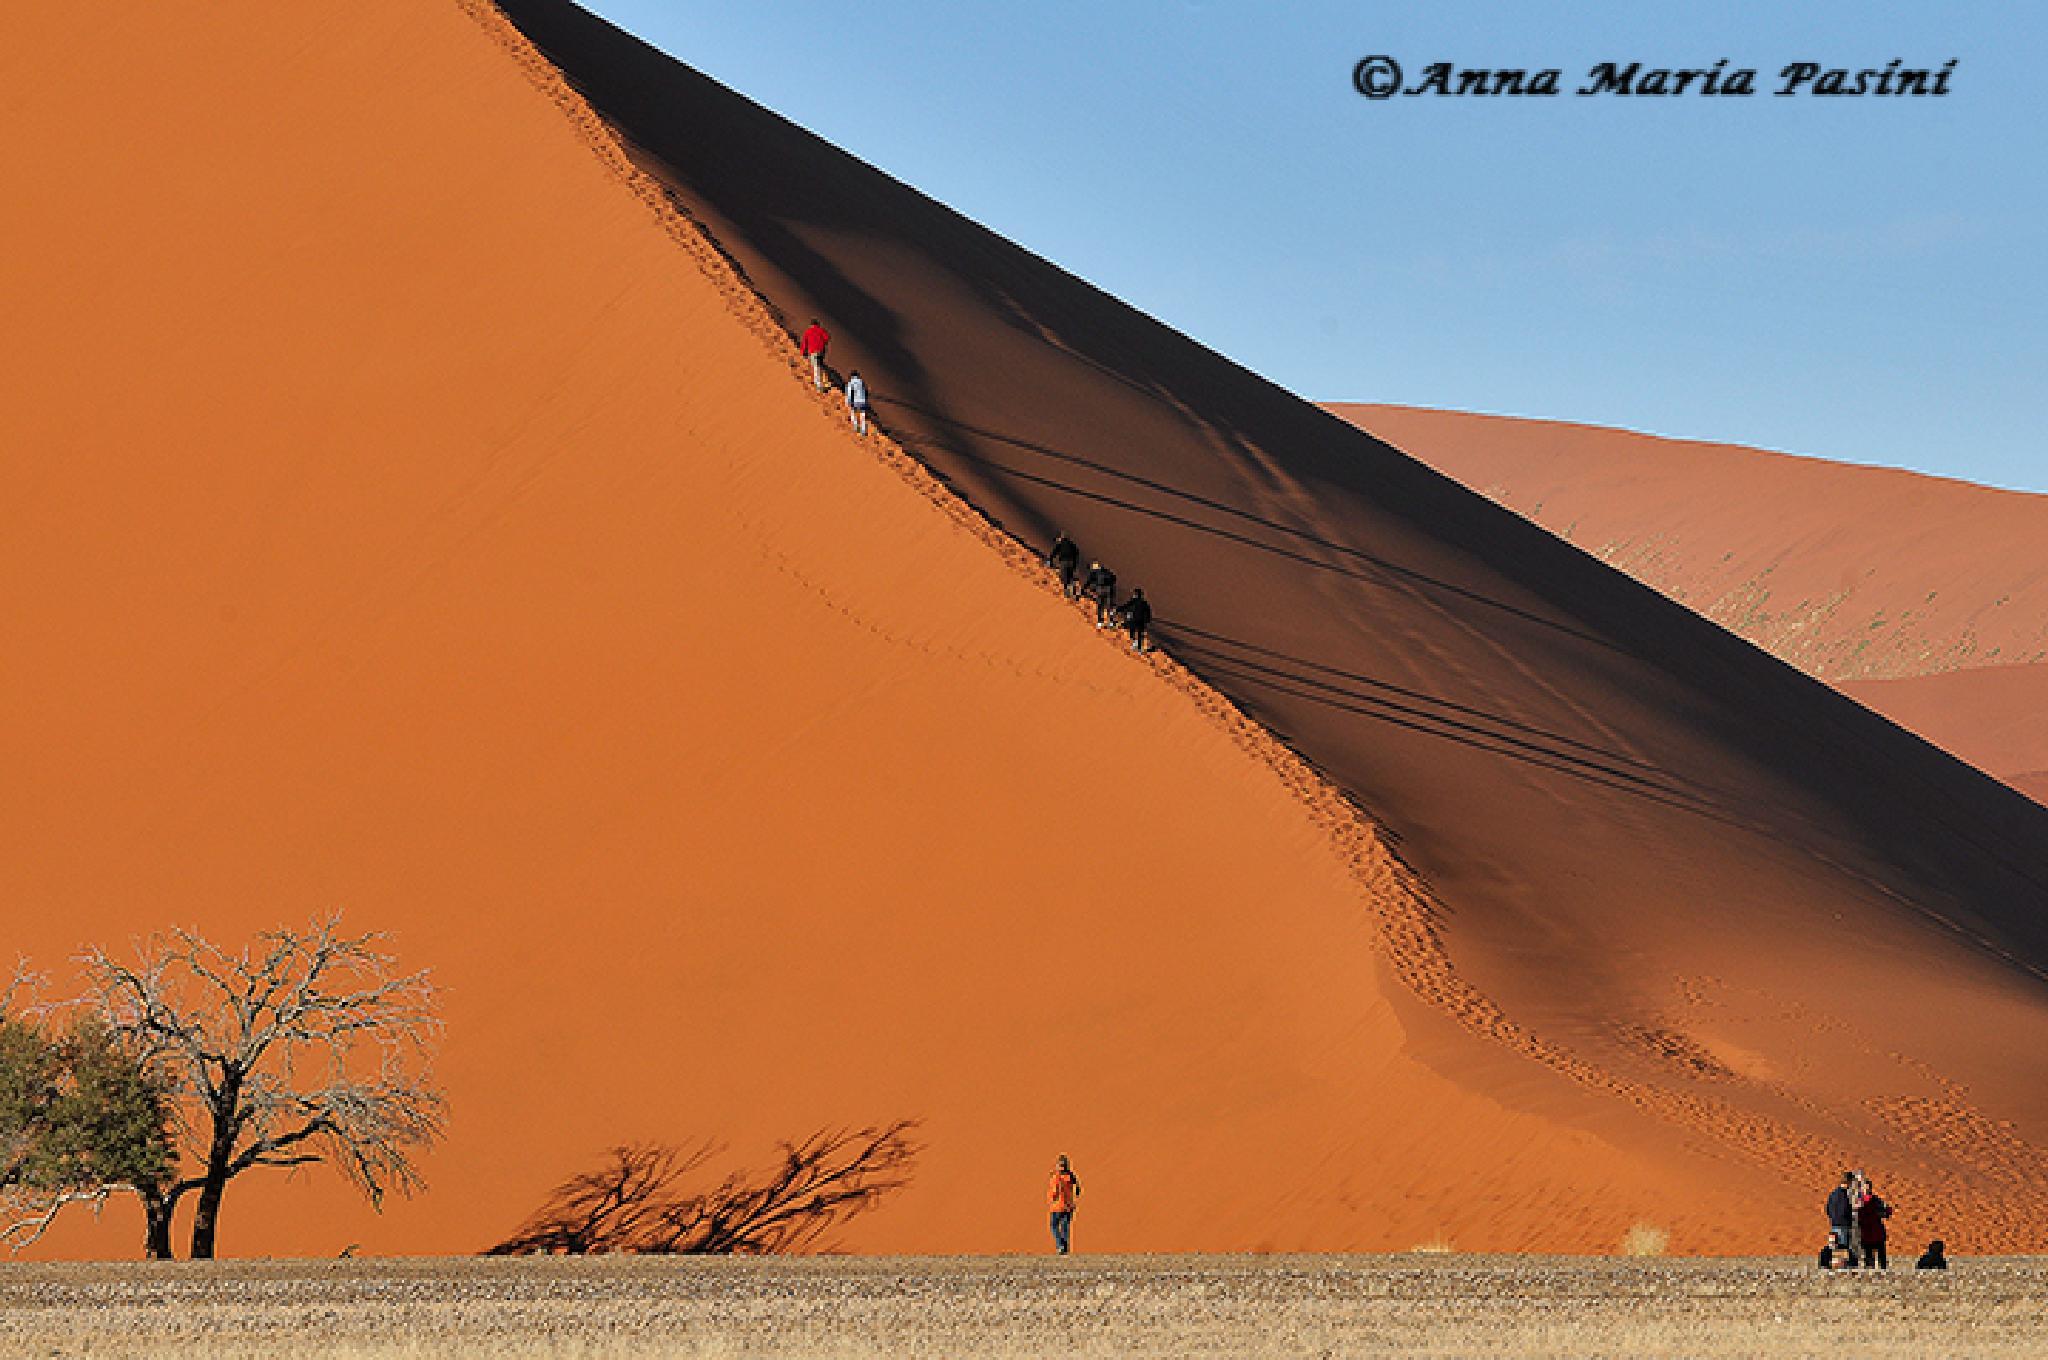 Duna di Sossusvlei (Namibia) by annamariapasini